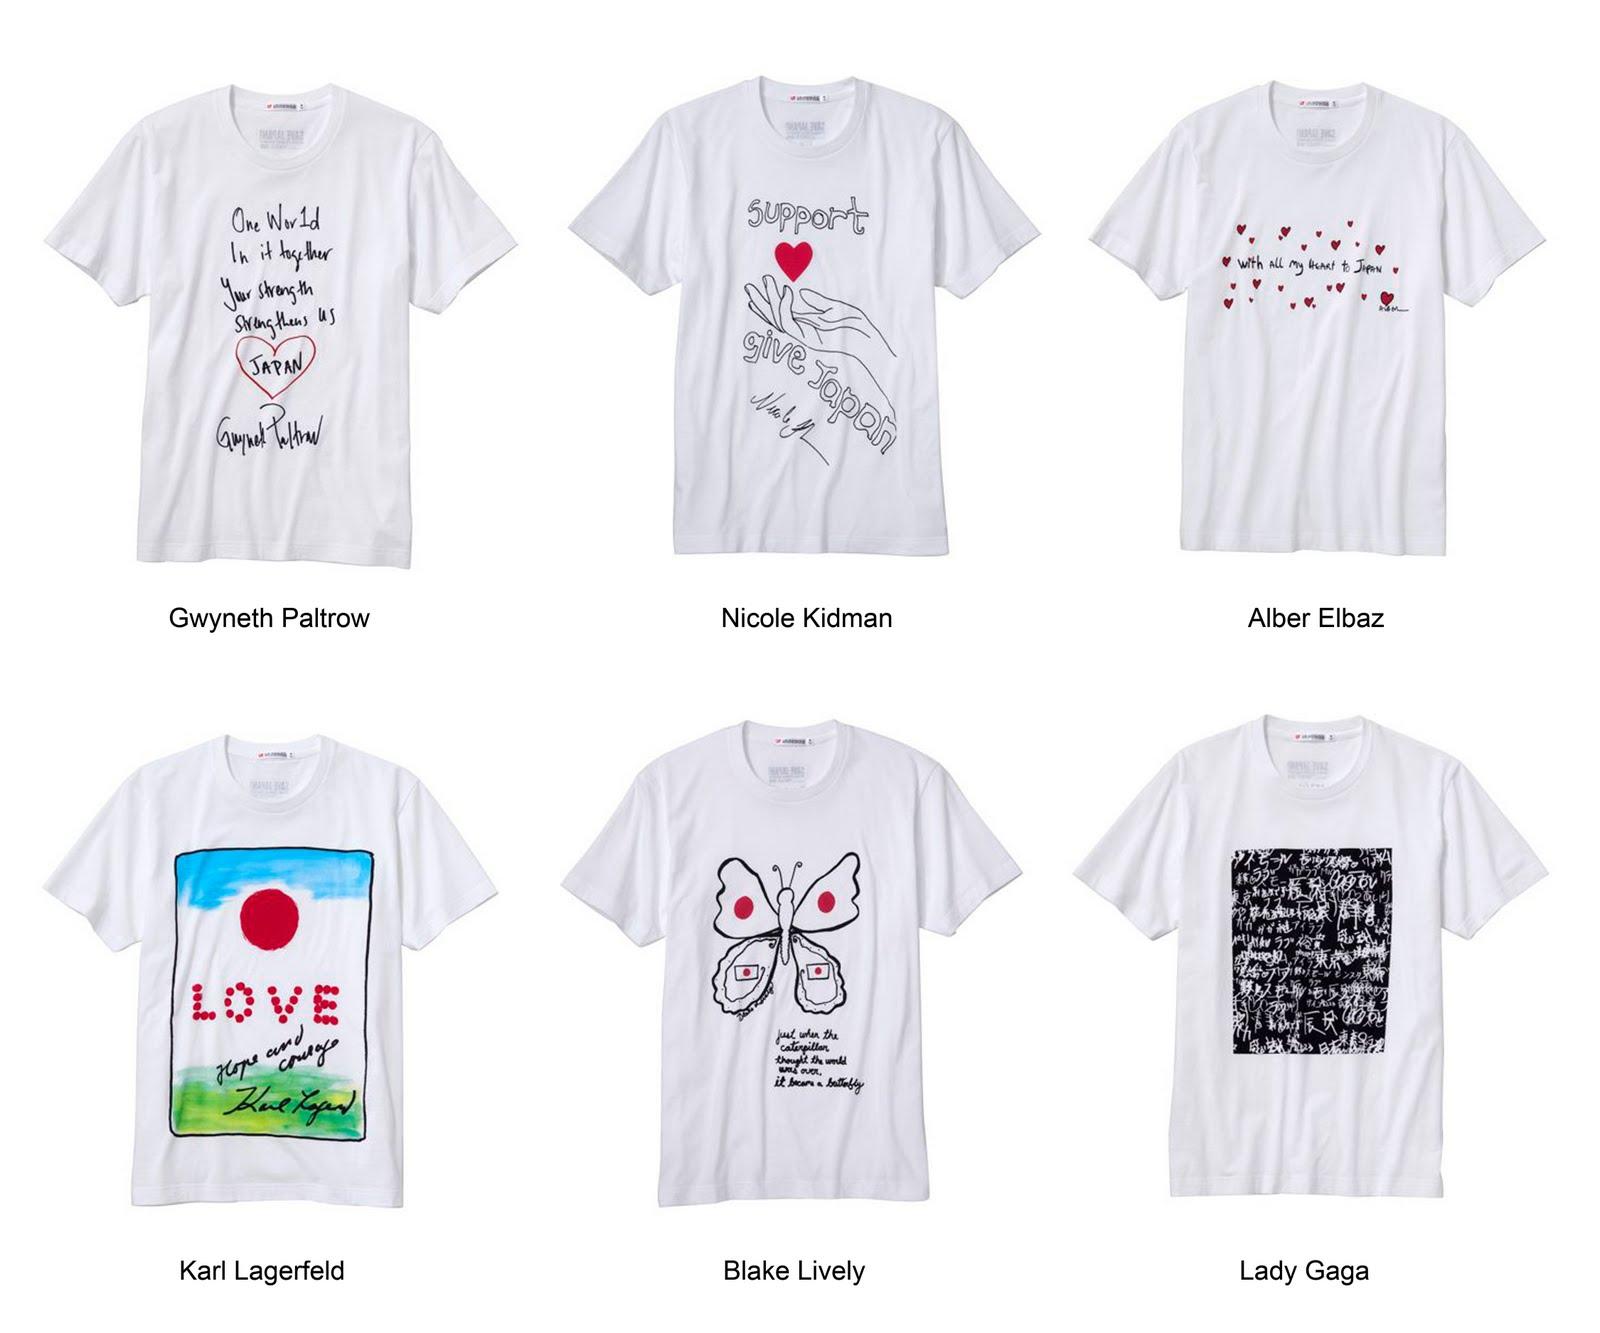 http://2.bp.blogspot.com/-CaiUnv7G-8A/TdyC5bS1TxI/AAAAAAAAA2Y/p0XrCOfhrys/s1600/Uniqlo_tees_for_Japan_low_res.jpg